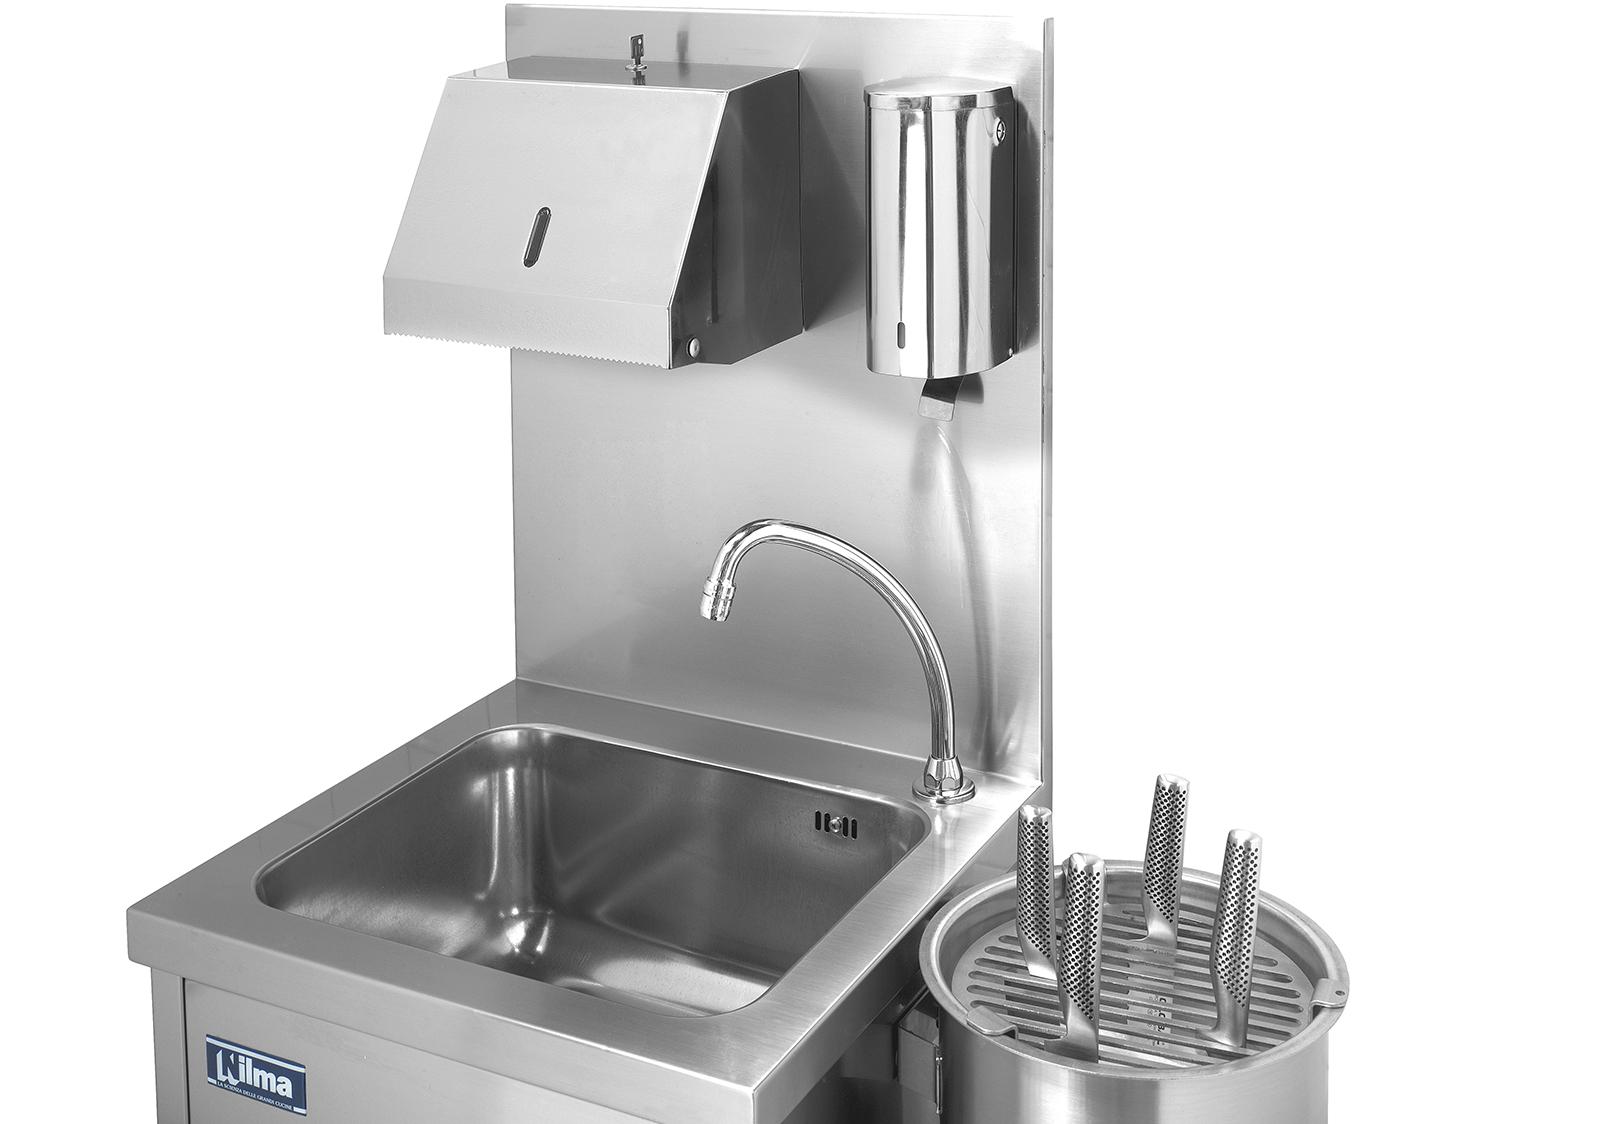 KLINER- hand wash and knife sterilizer Nilma